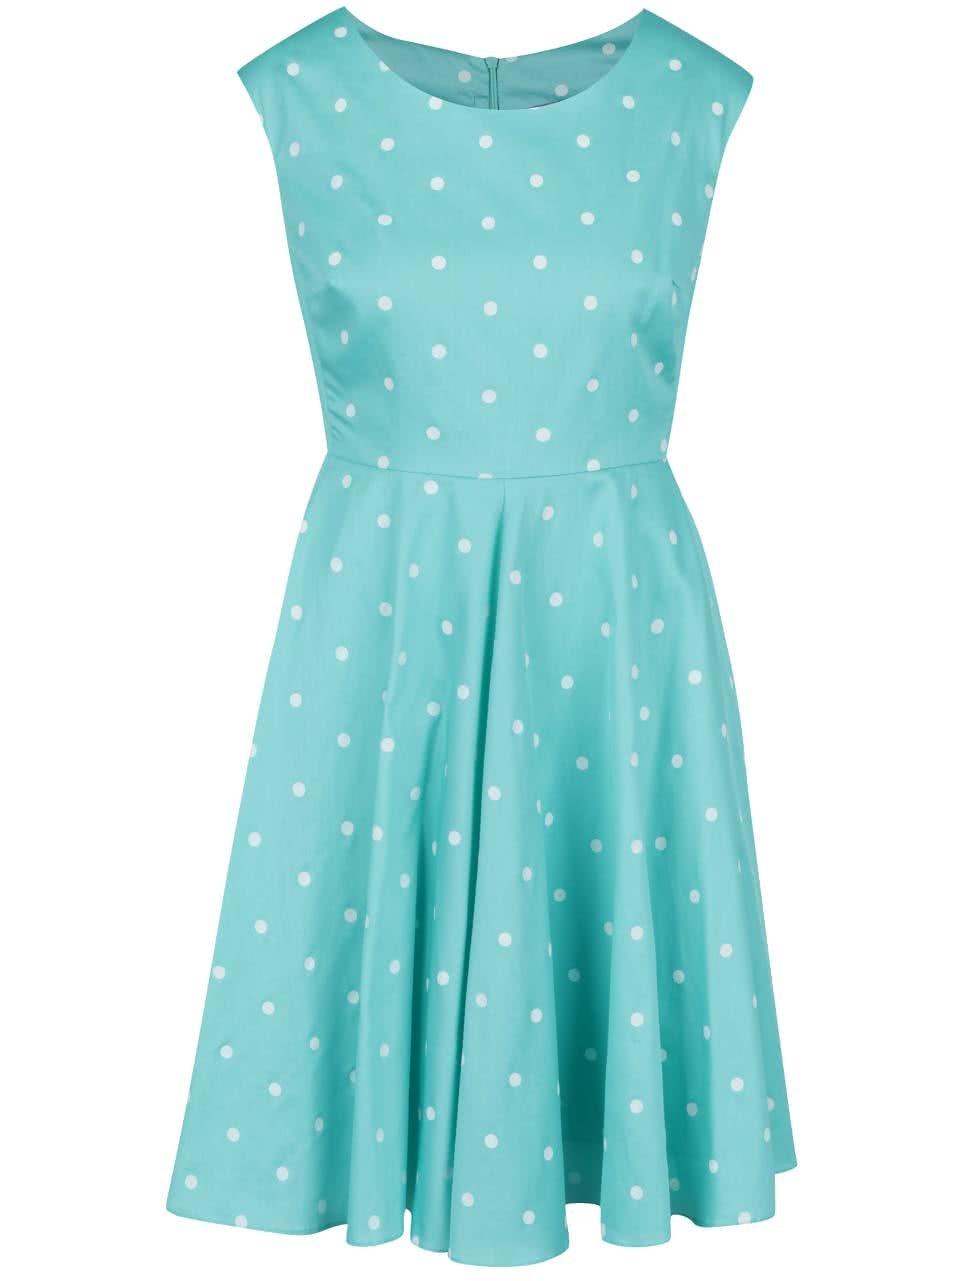 5bde23820e27 Zelené puntíkované šaty Tom Joule Amelie ...